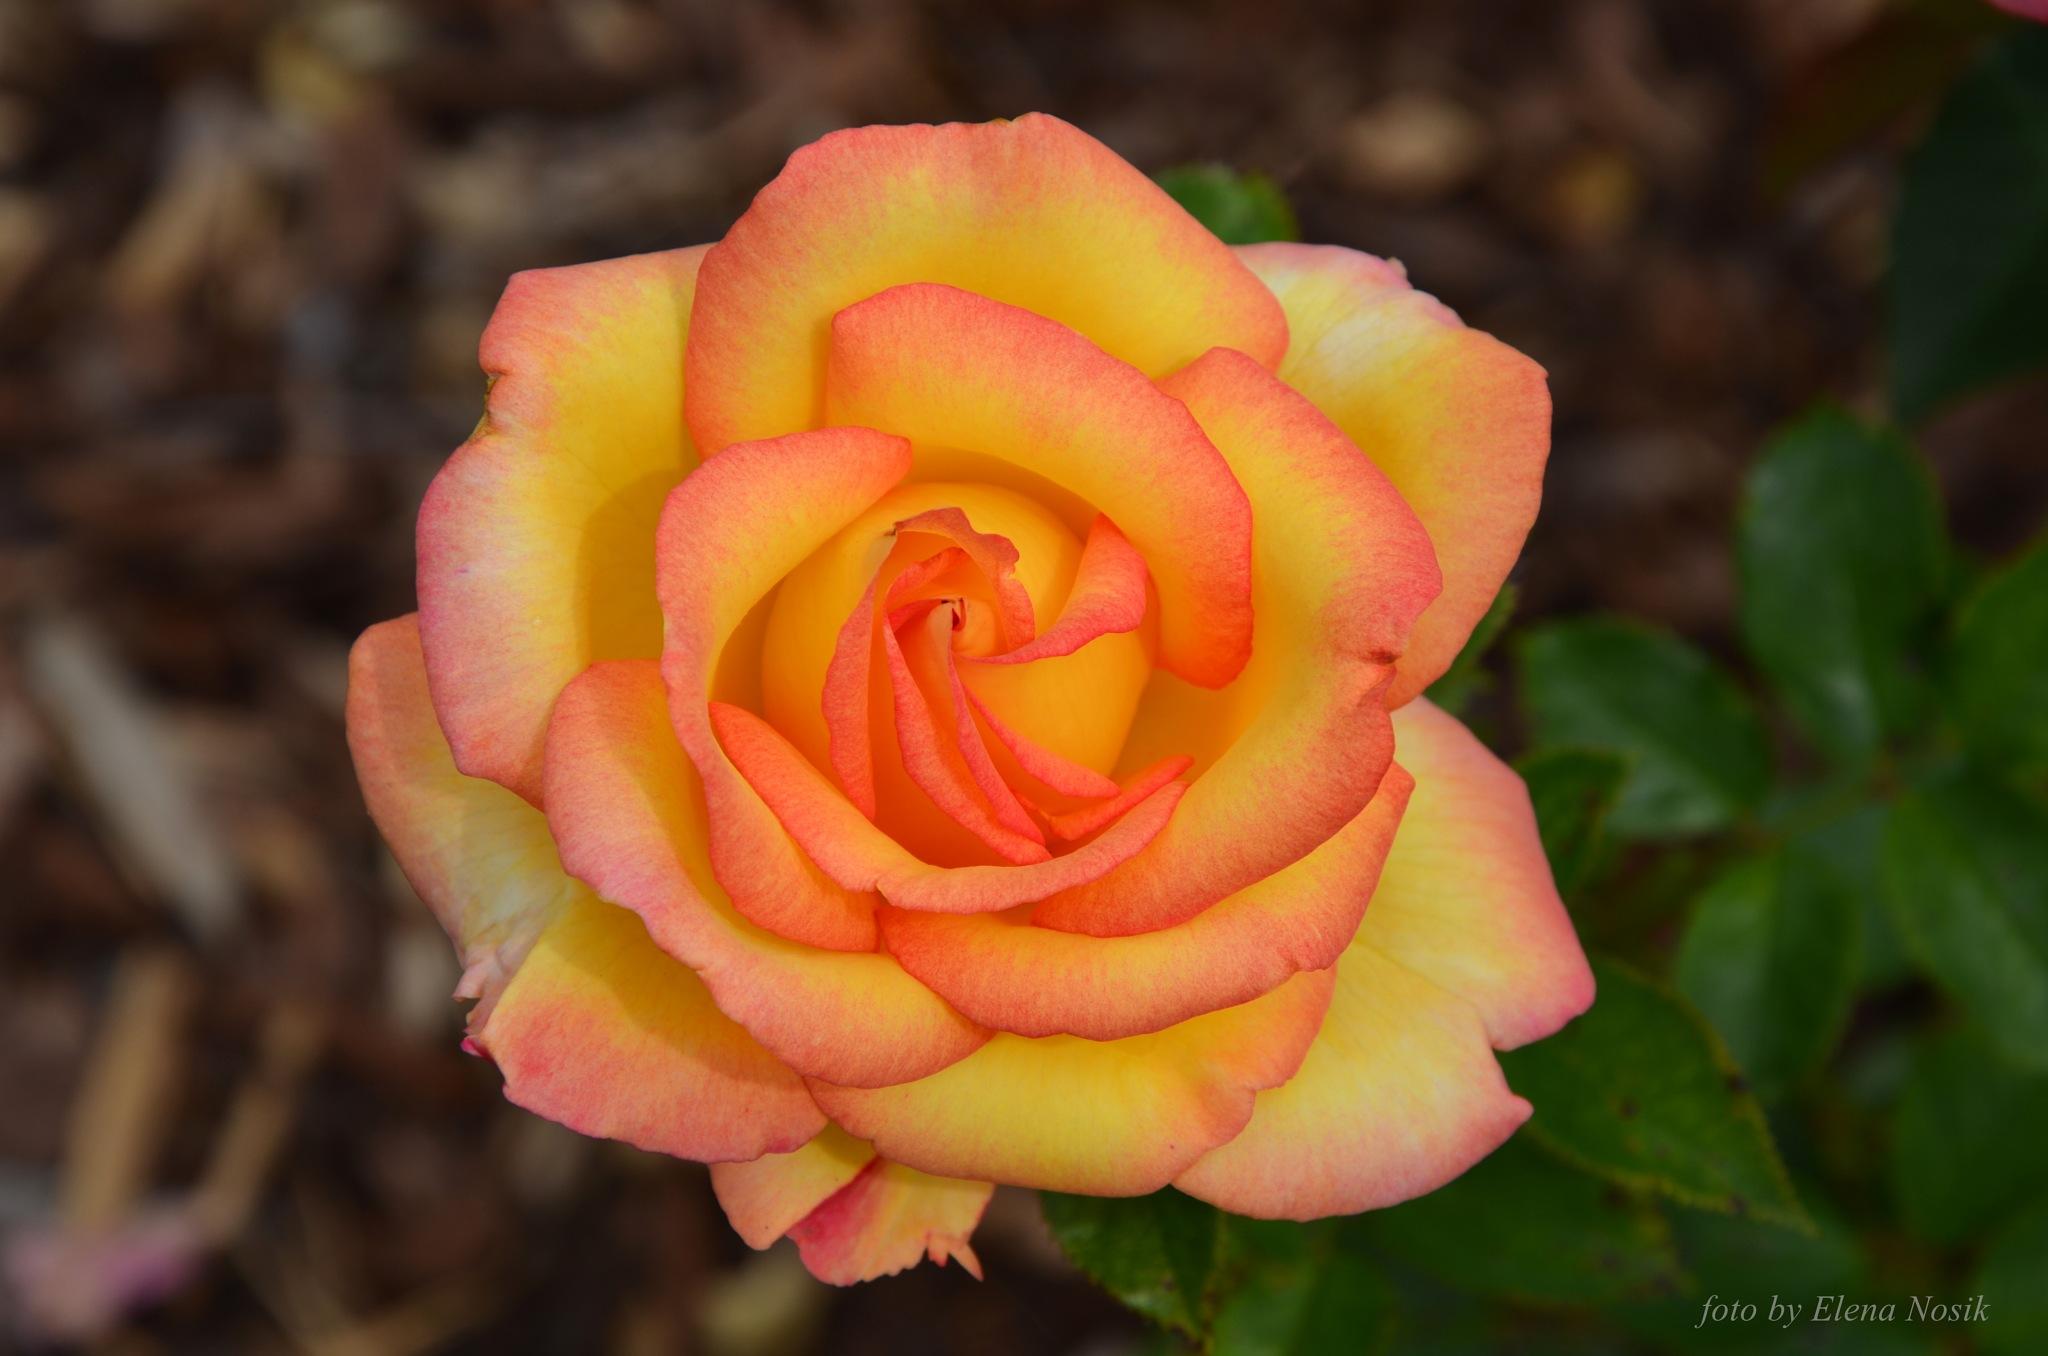 Rose by ElenaNosik